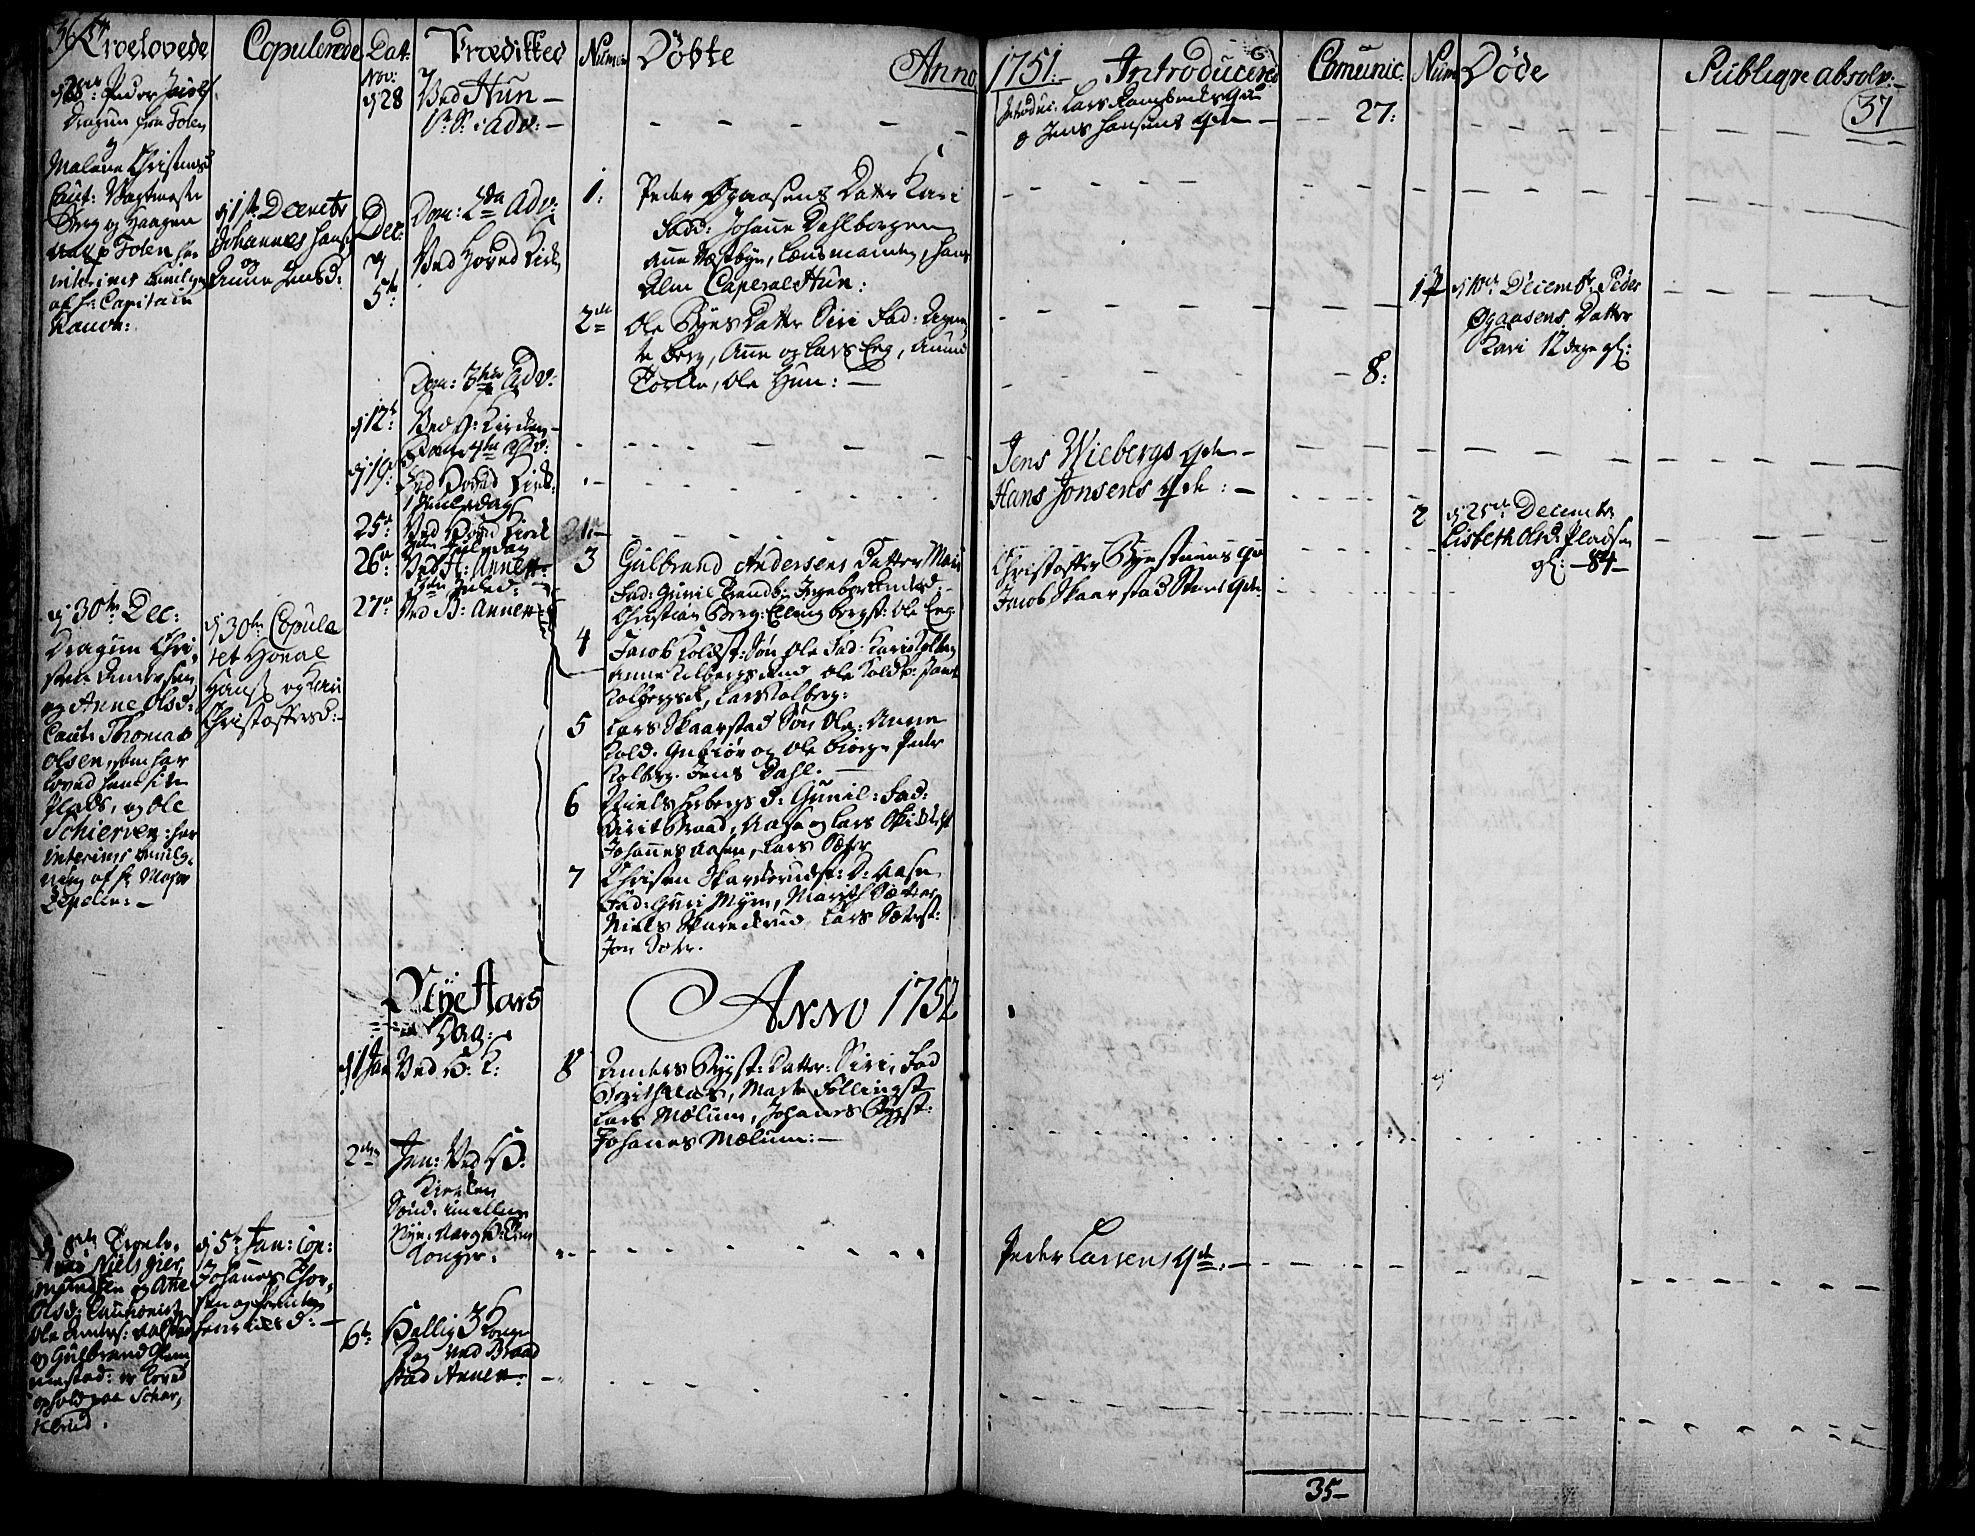 SAH, Vardal prestekontor, H/Ha/Haa/L0002: Ministerialbok nr. 2, 1748-1776, s. 36-37